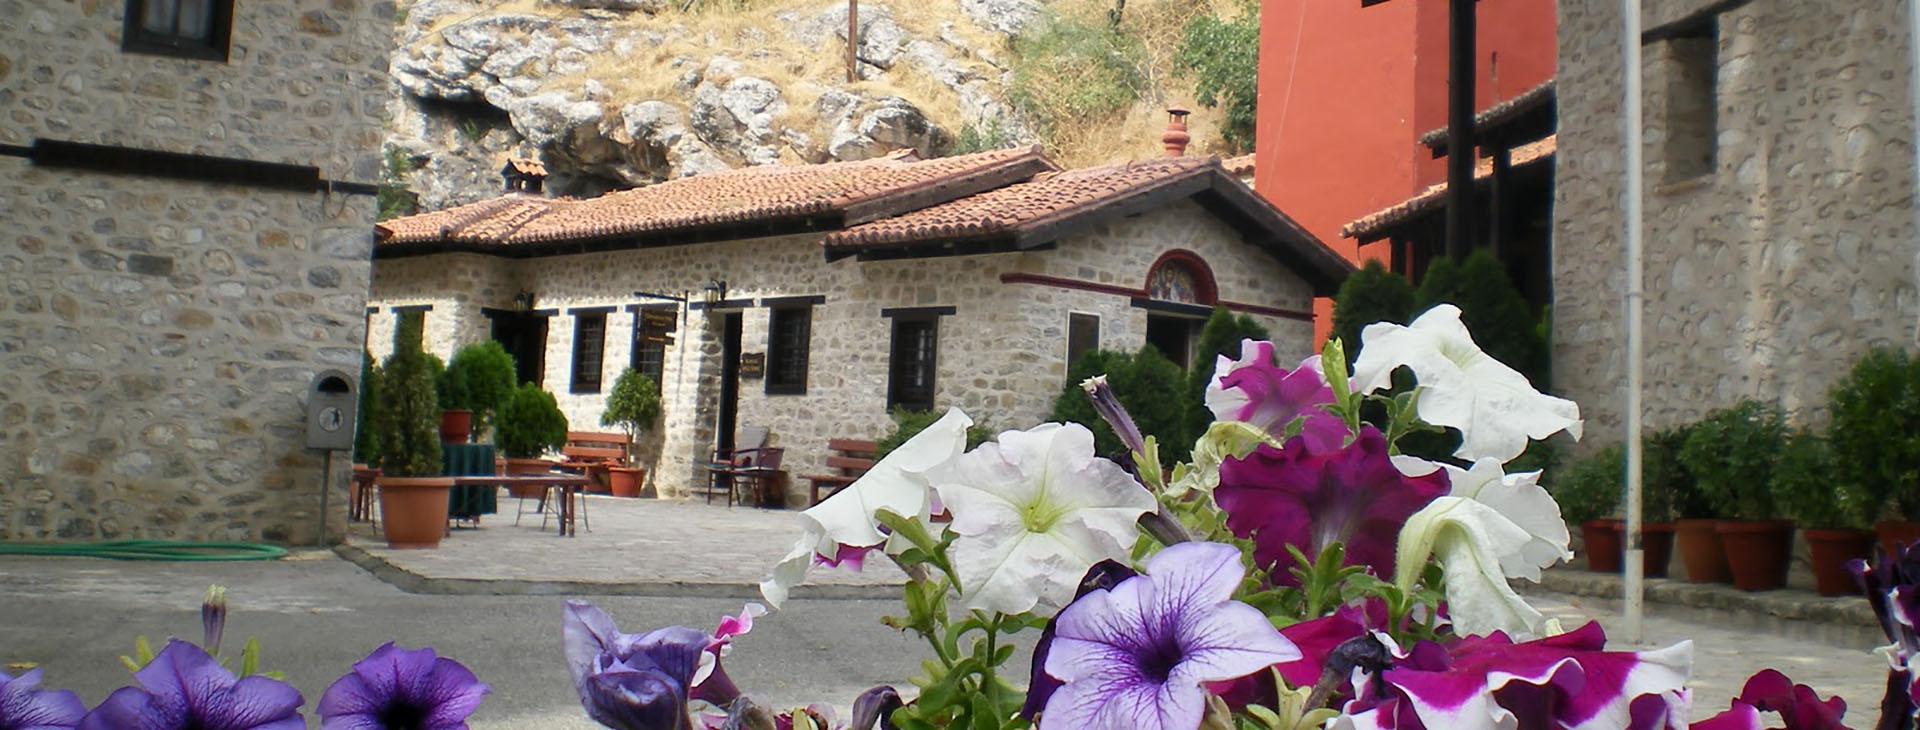 Panagia Mayriotissa Monastery, Kastoria